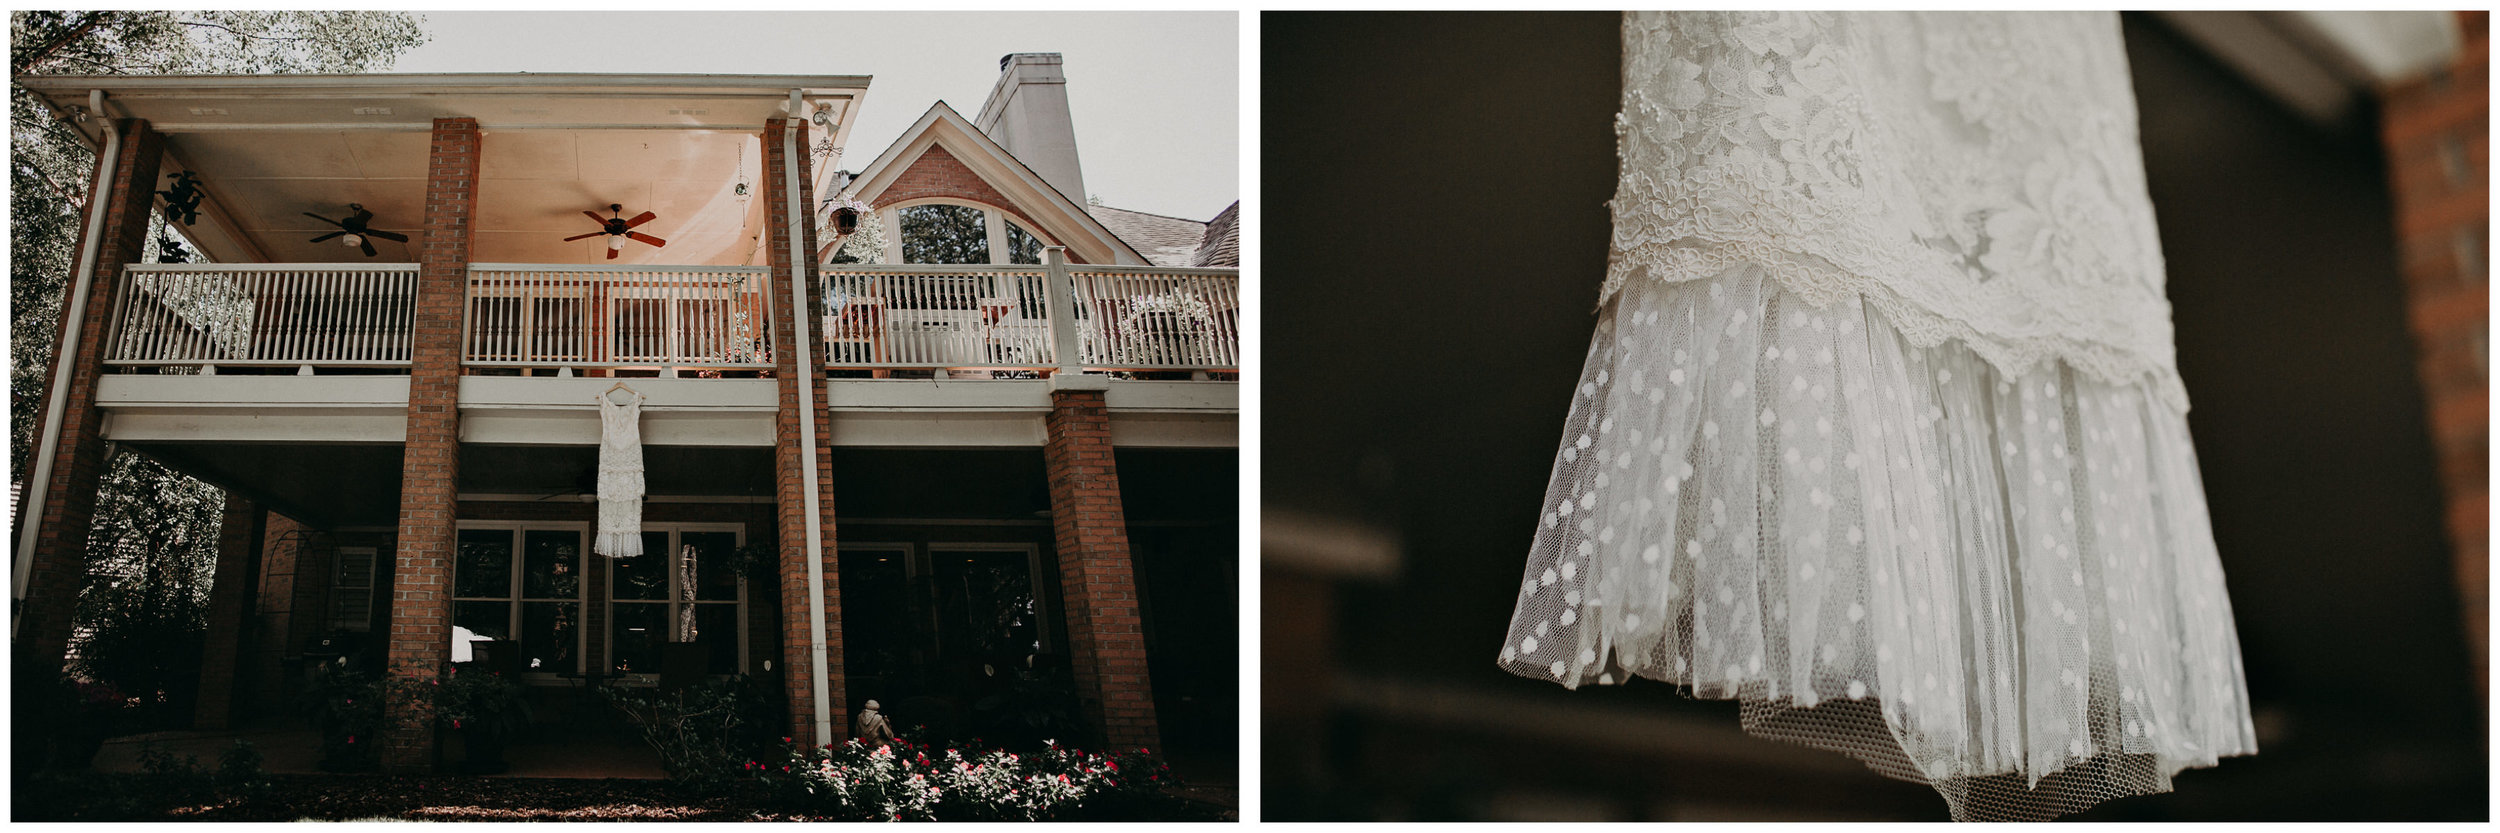 1 Vintage wedding Dress Atlanta Photography .jpg